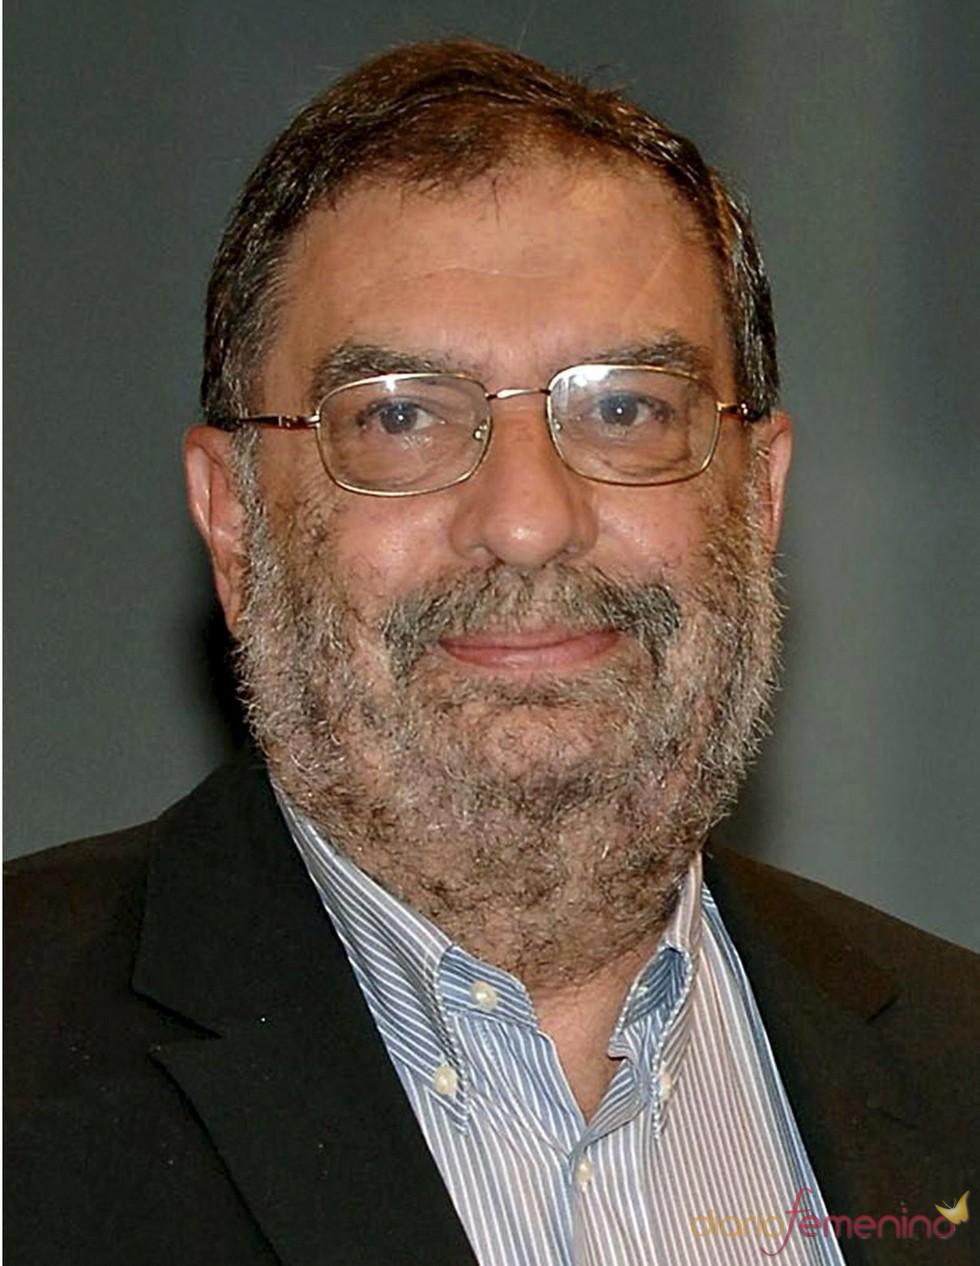 Enrique González-Macho, candidato a presidir la Academia de Cine